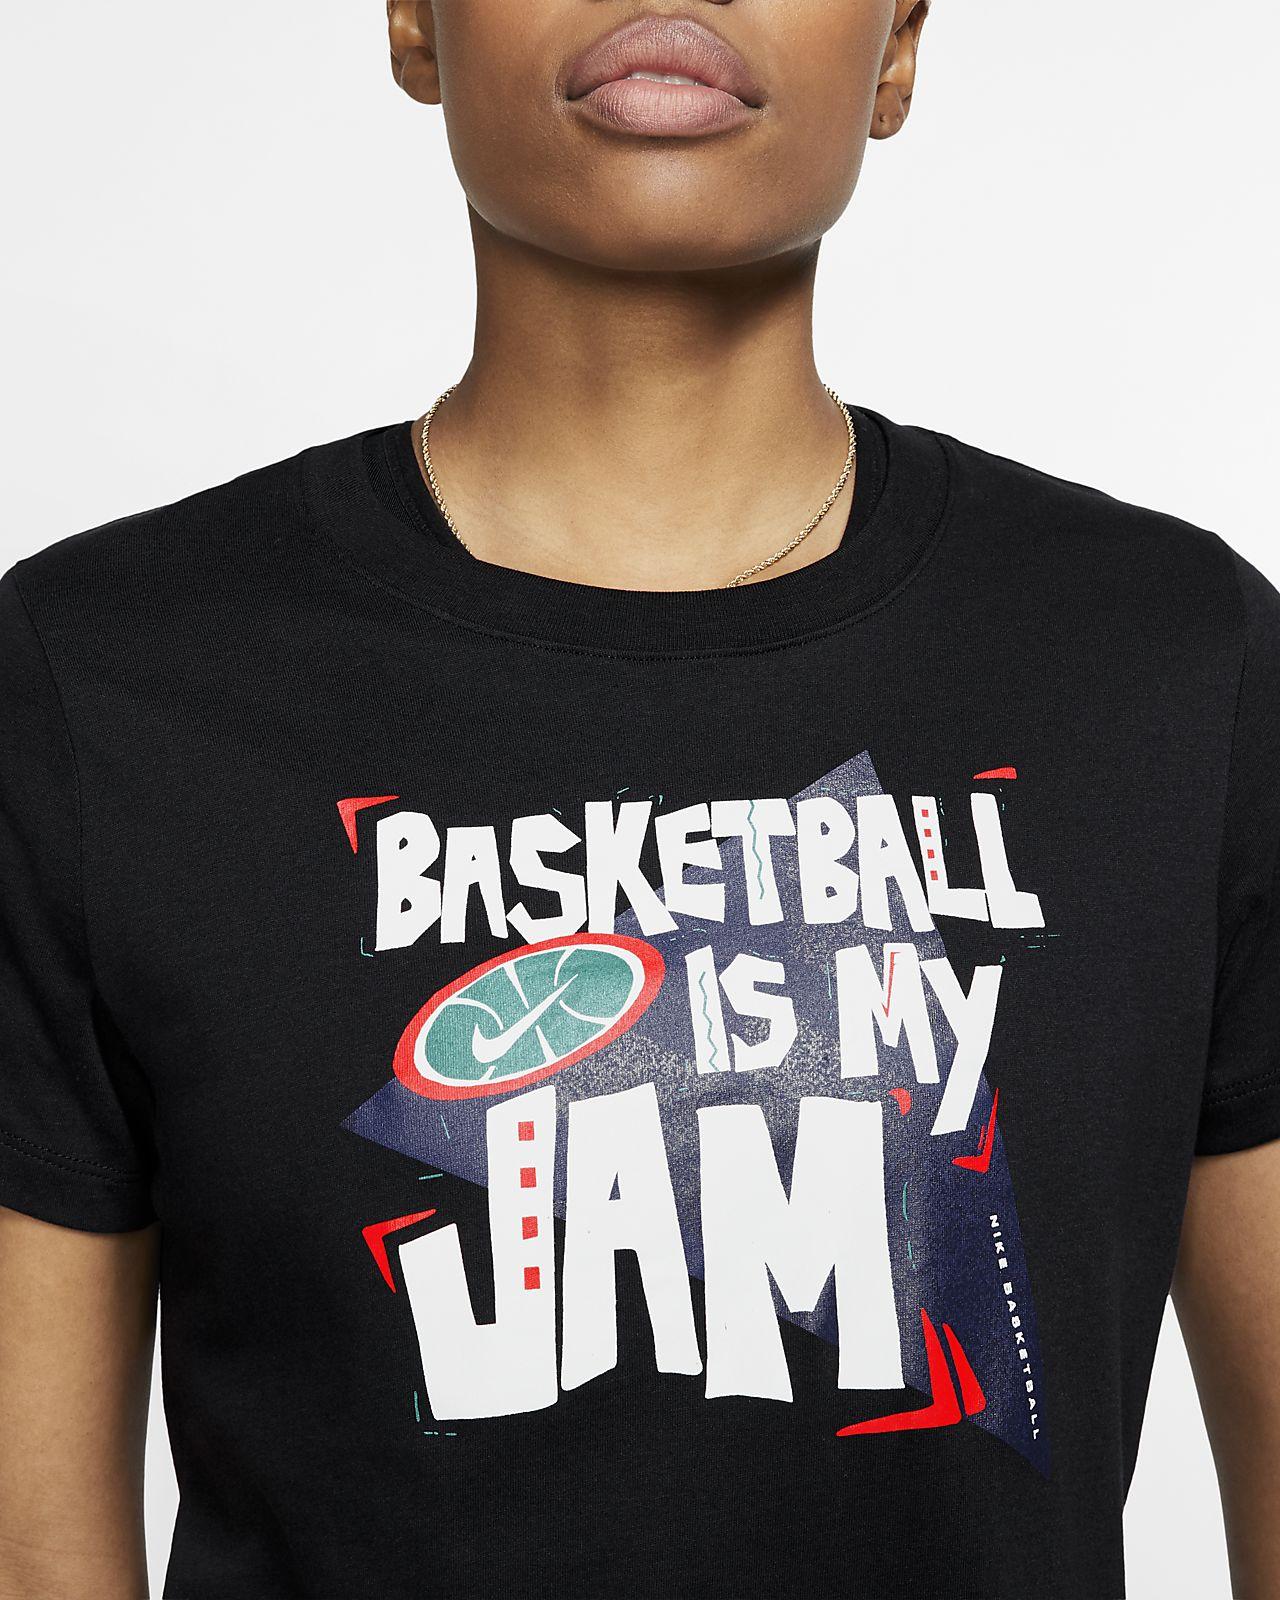 Basketball Dri FemmeBe De Shirt Pour Fit Tee Nike wXZlPTOkiu